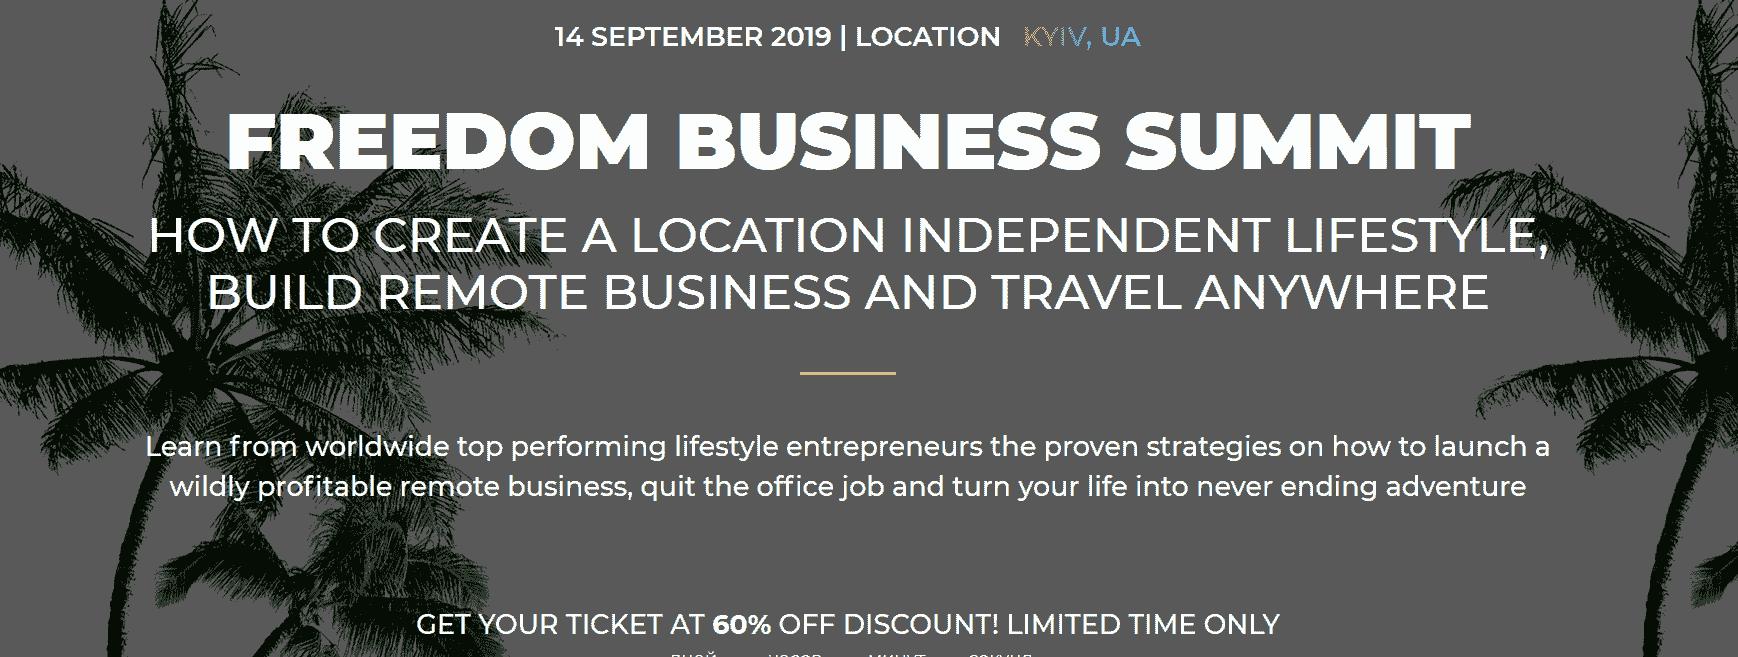 Freedom >Business Summit 2019